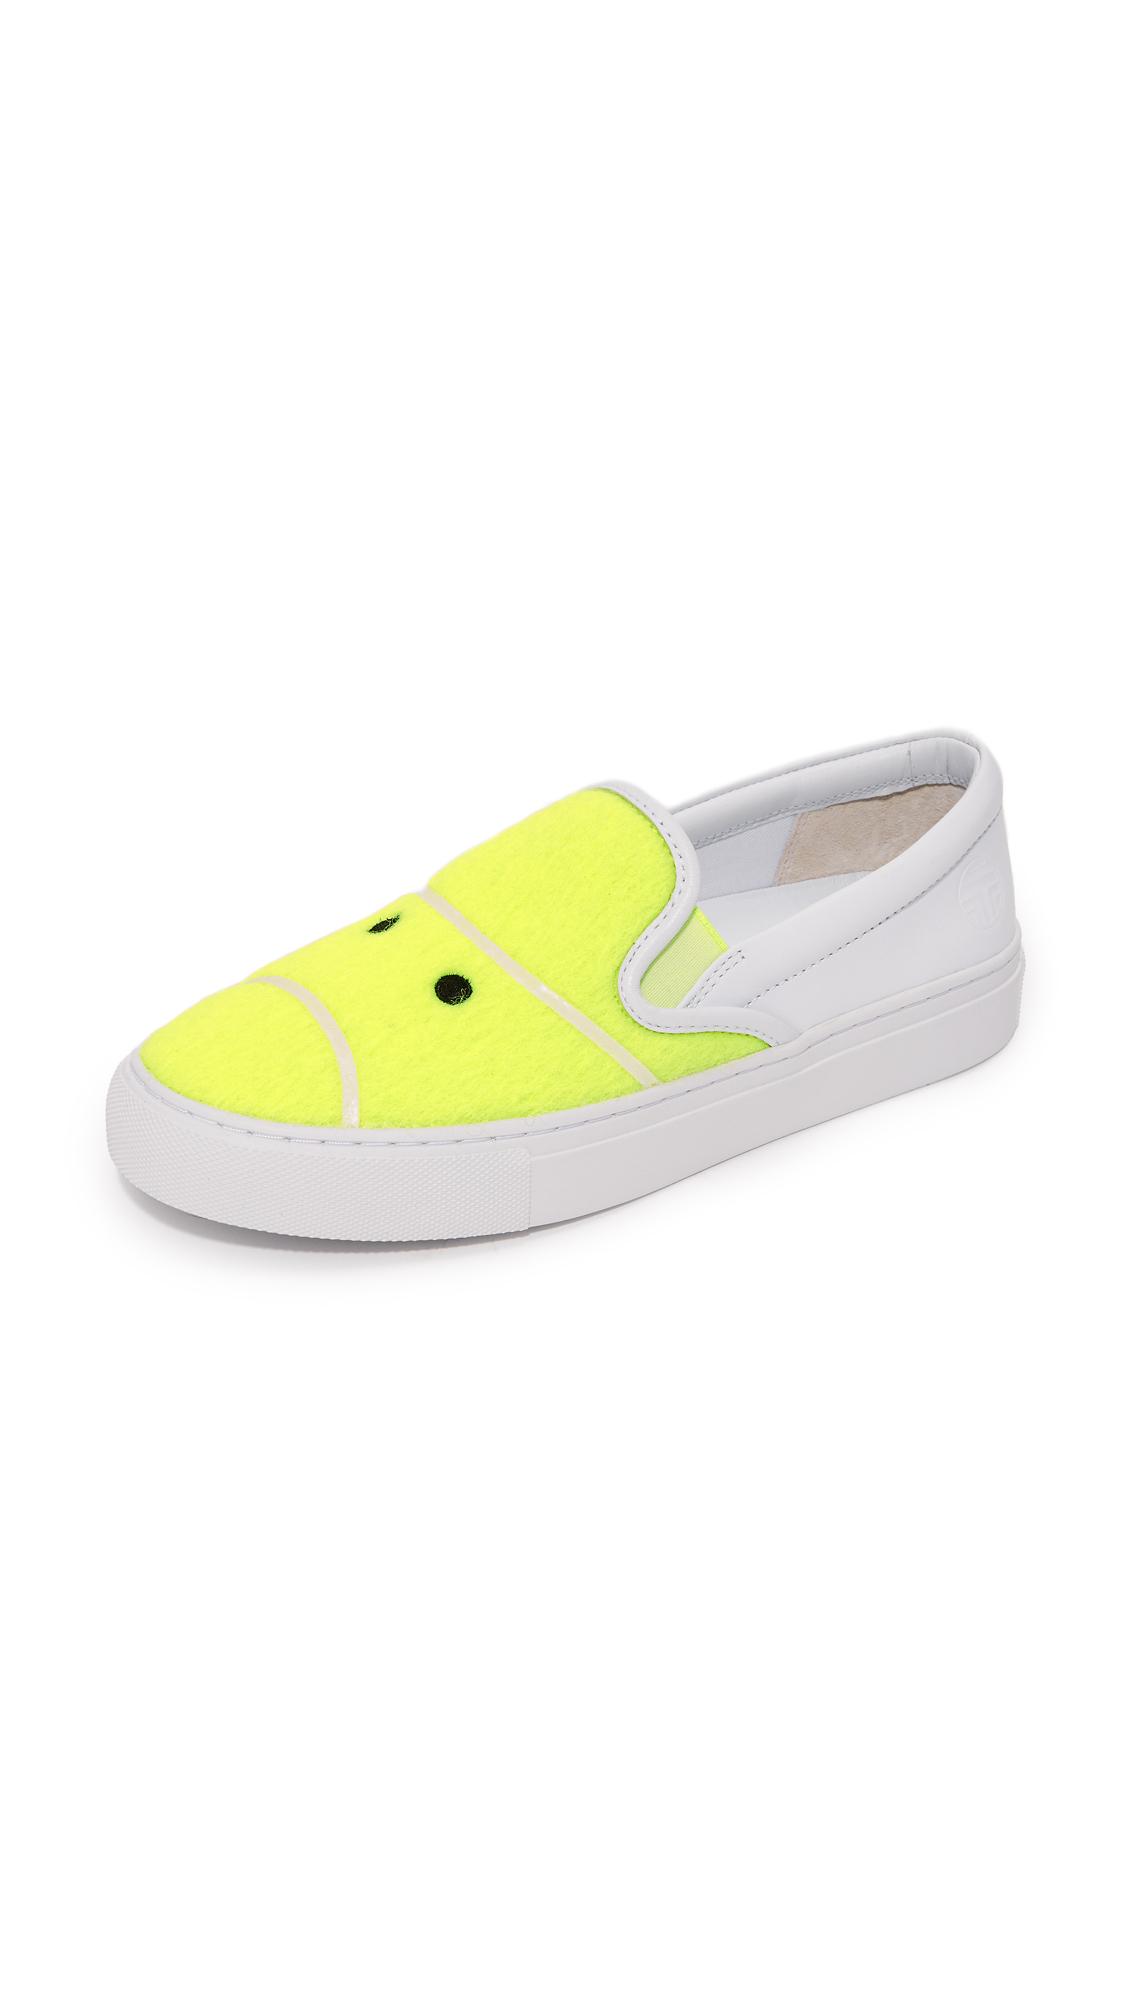 Tory Sport Tennis Felt Sneakers - Fluo Yellow/Snow White